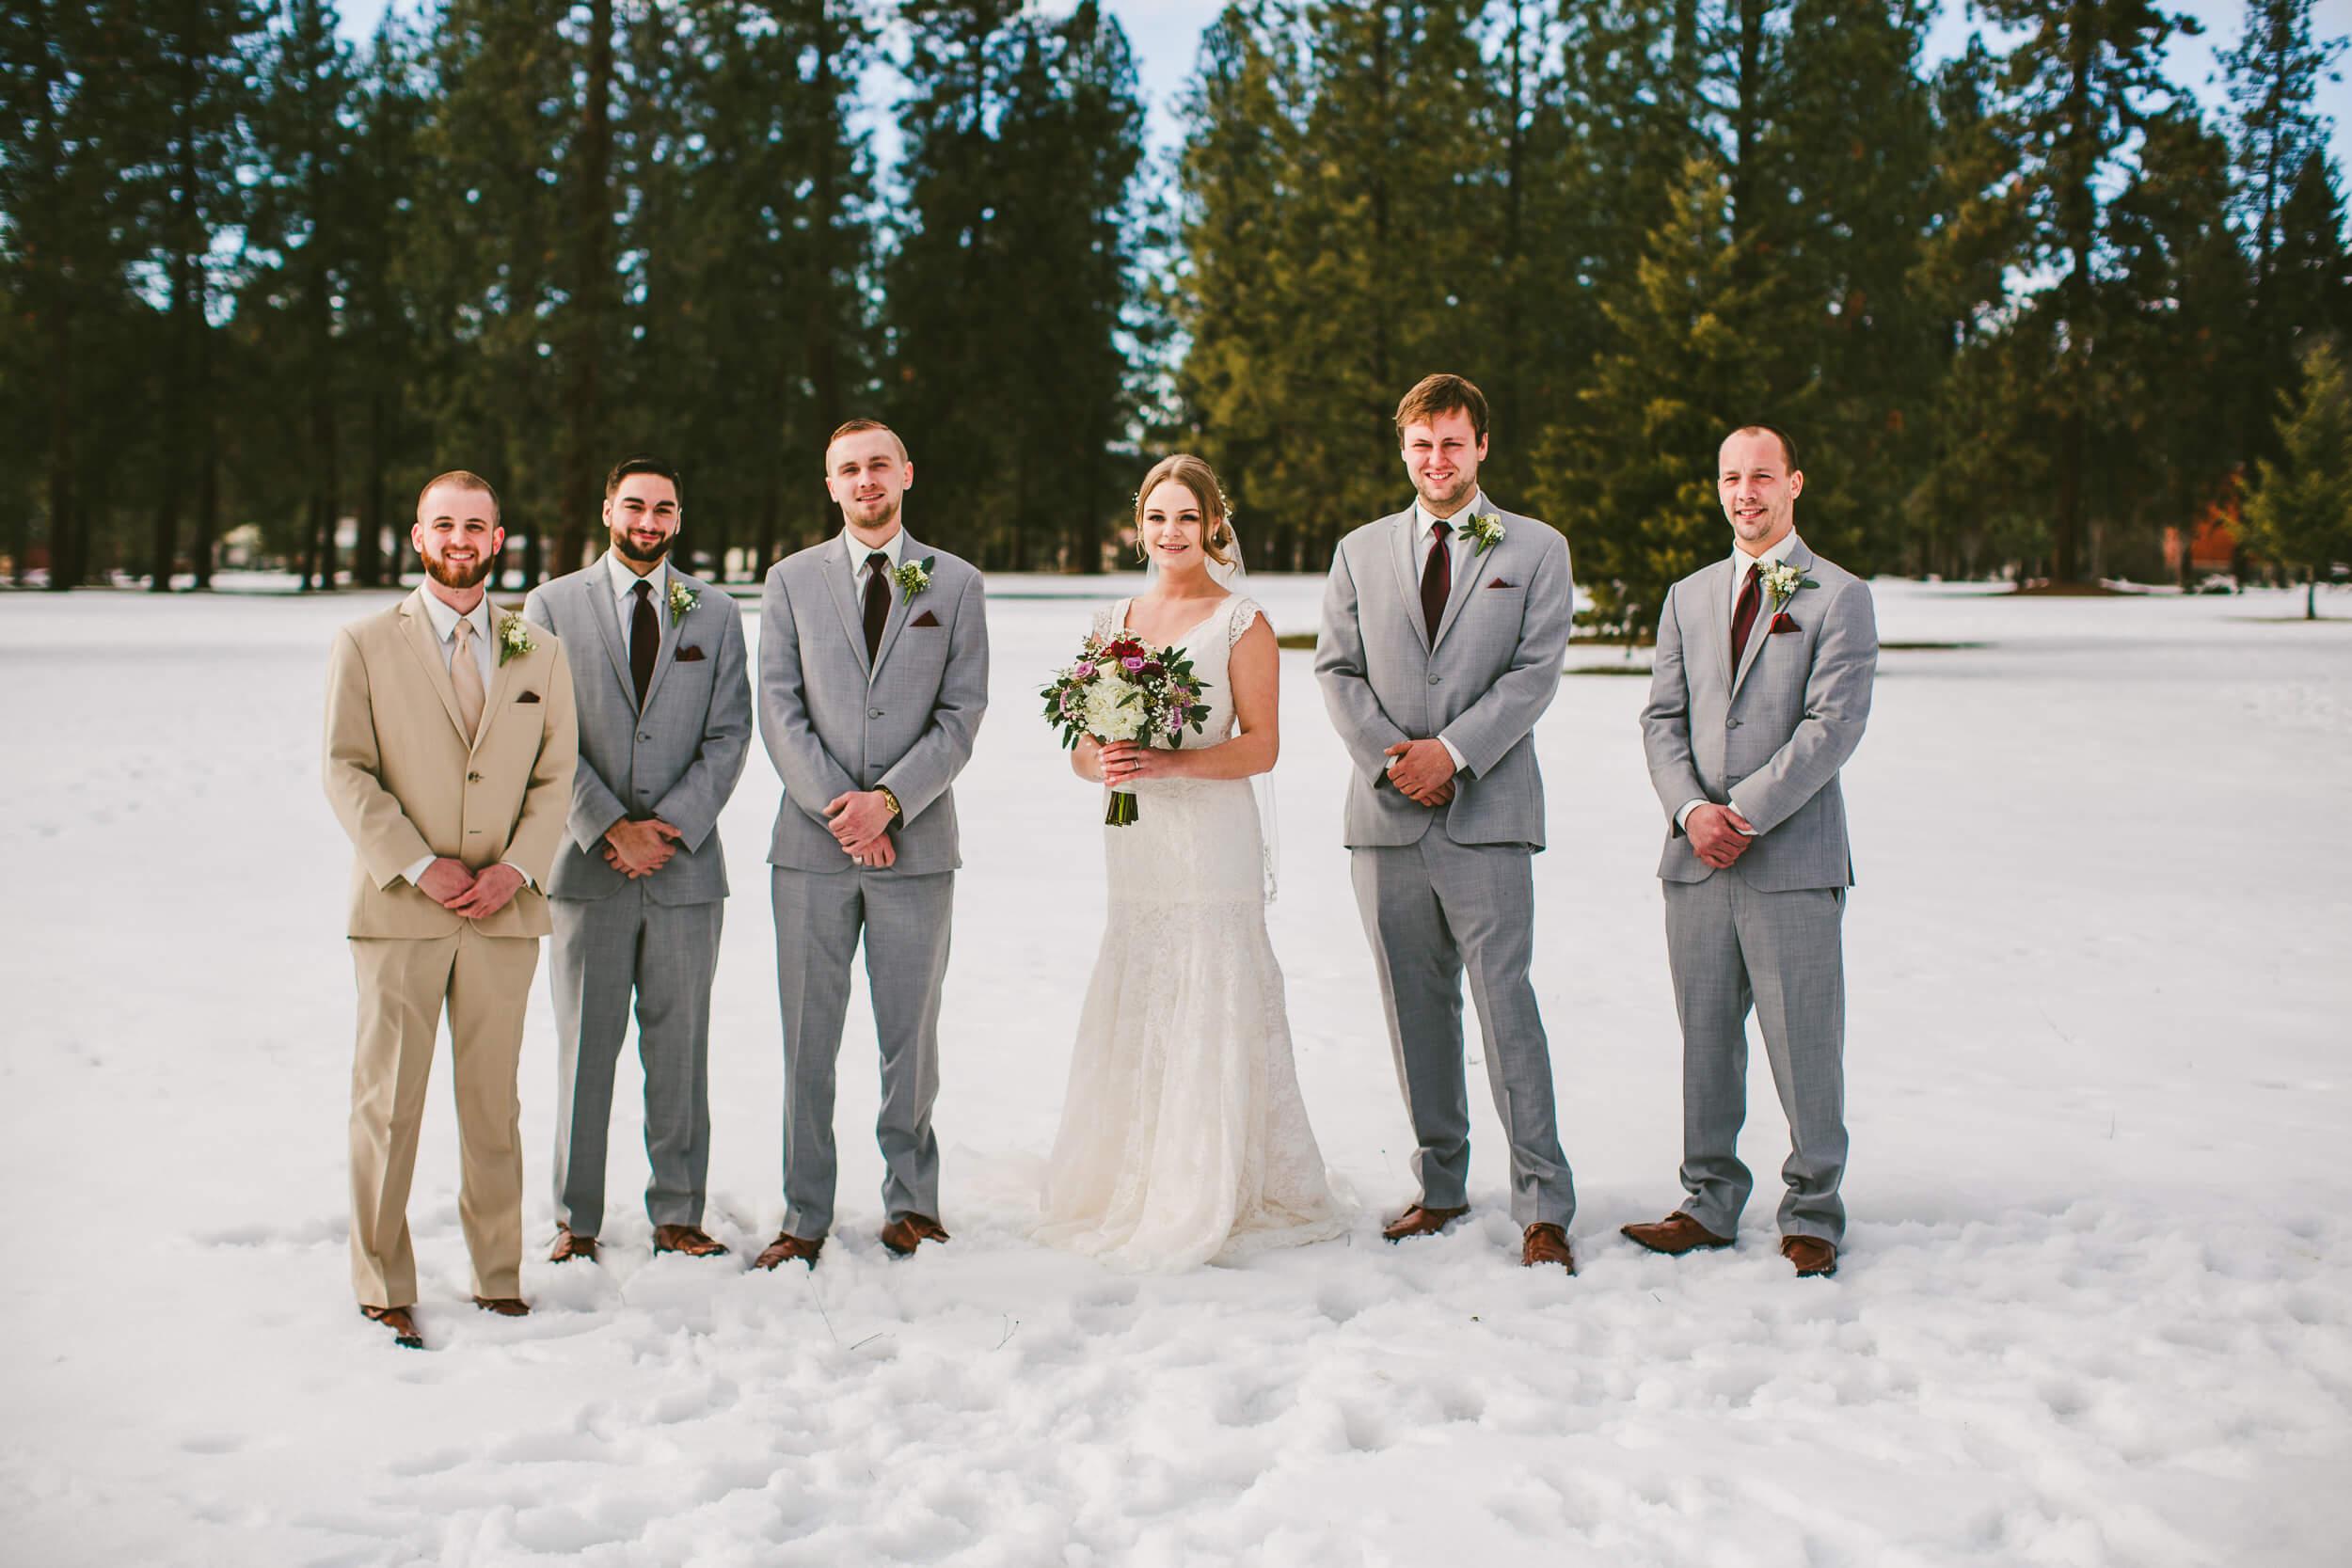 mukogawa winter wedding in spokane (116).jpg